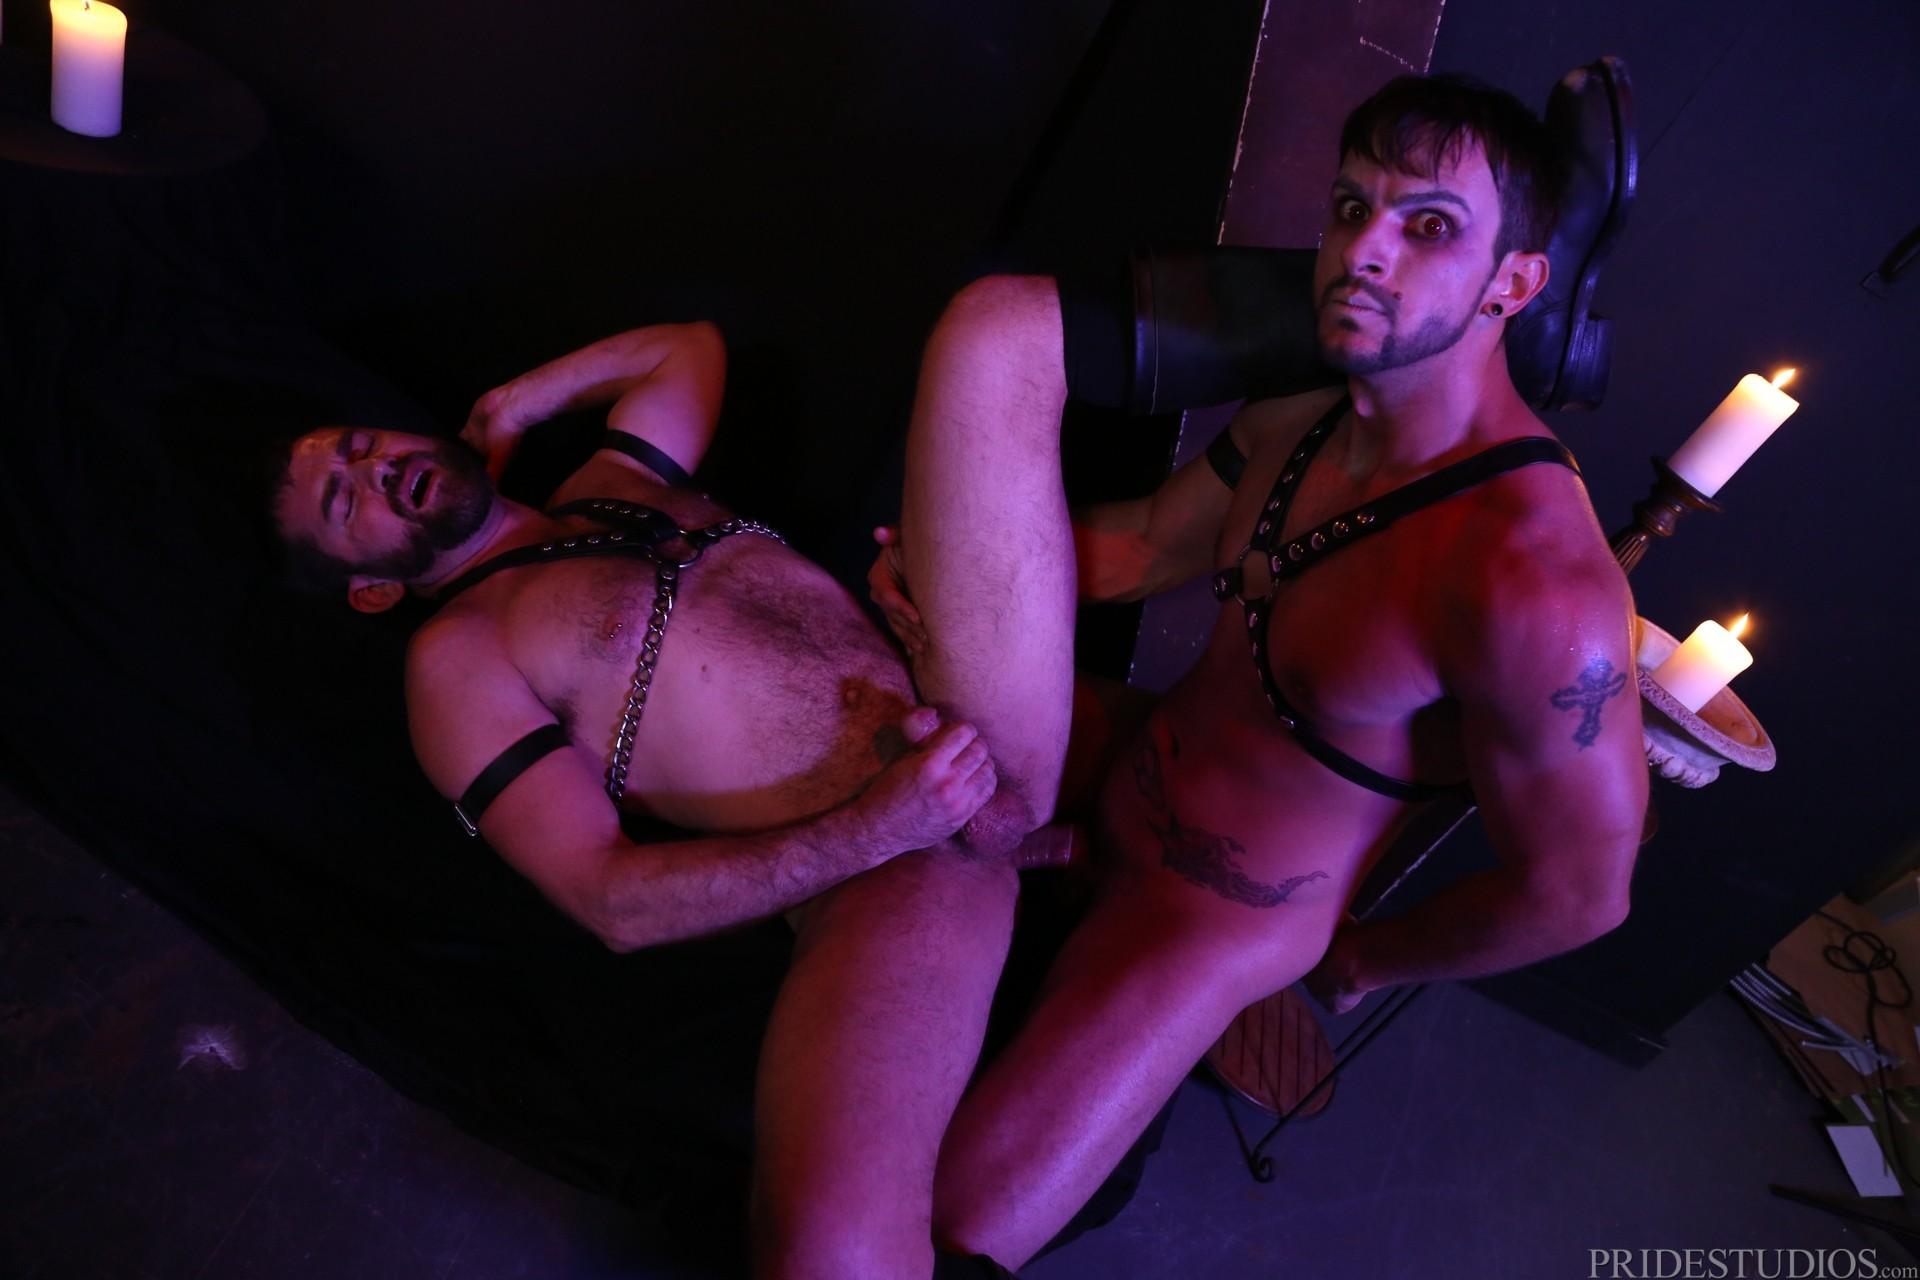 Evil bisexual pride